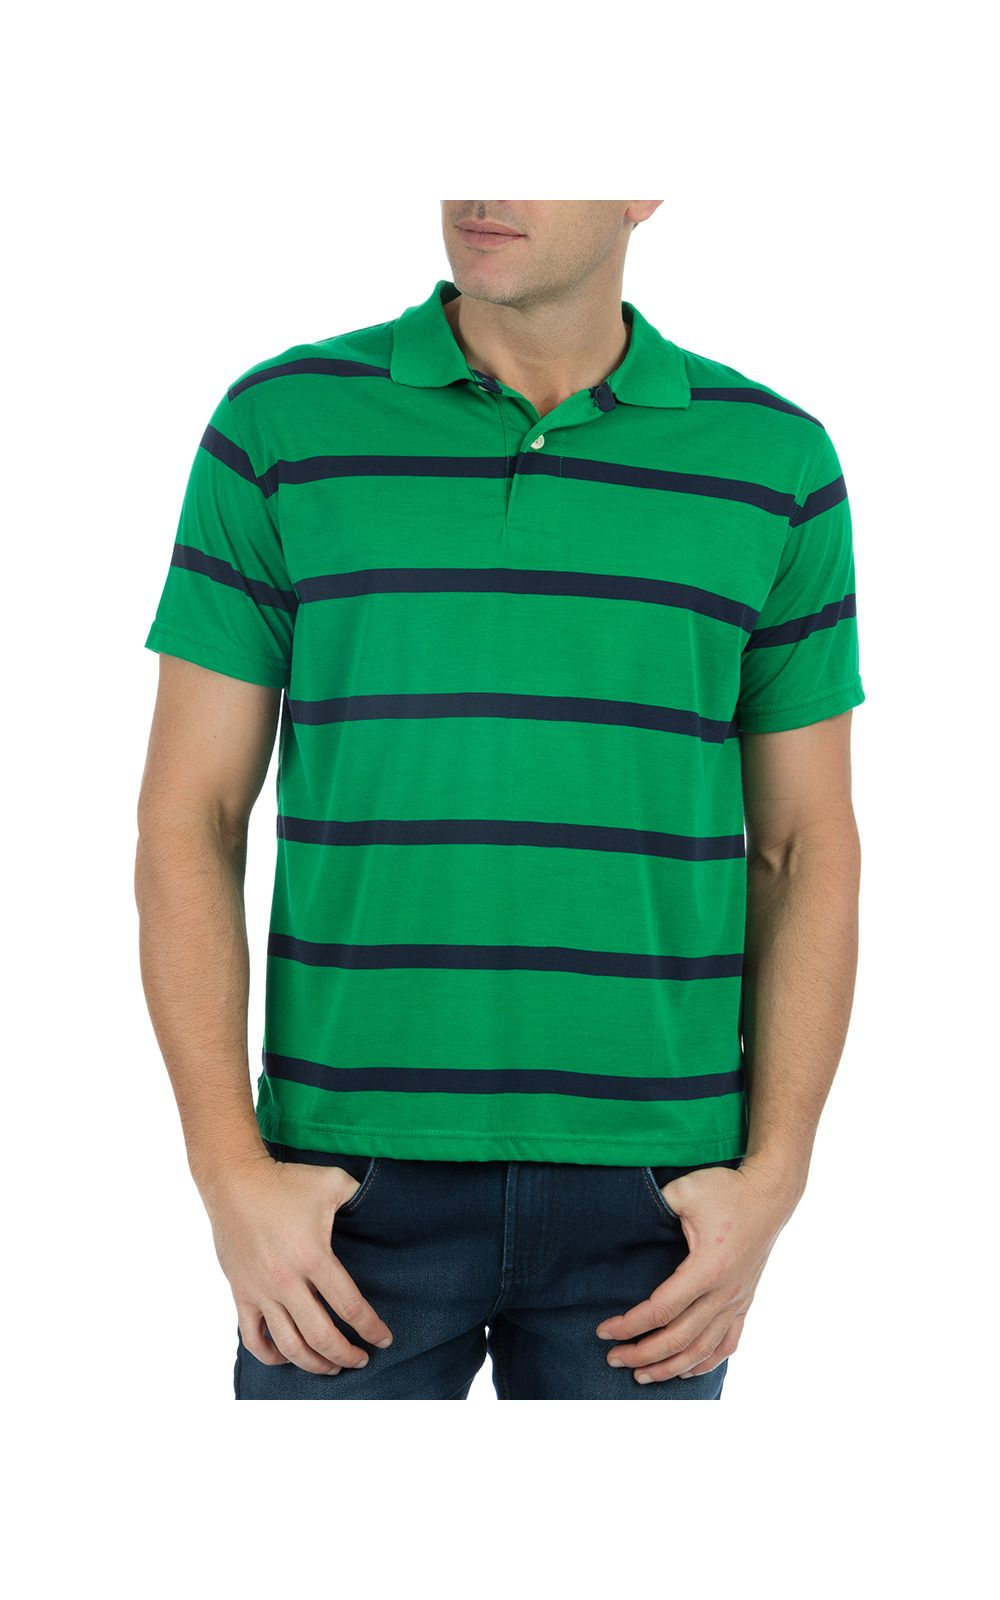 Foto 1 - Camisa Polo Masculina Verde Listrada